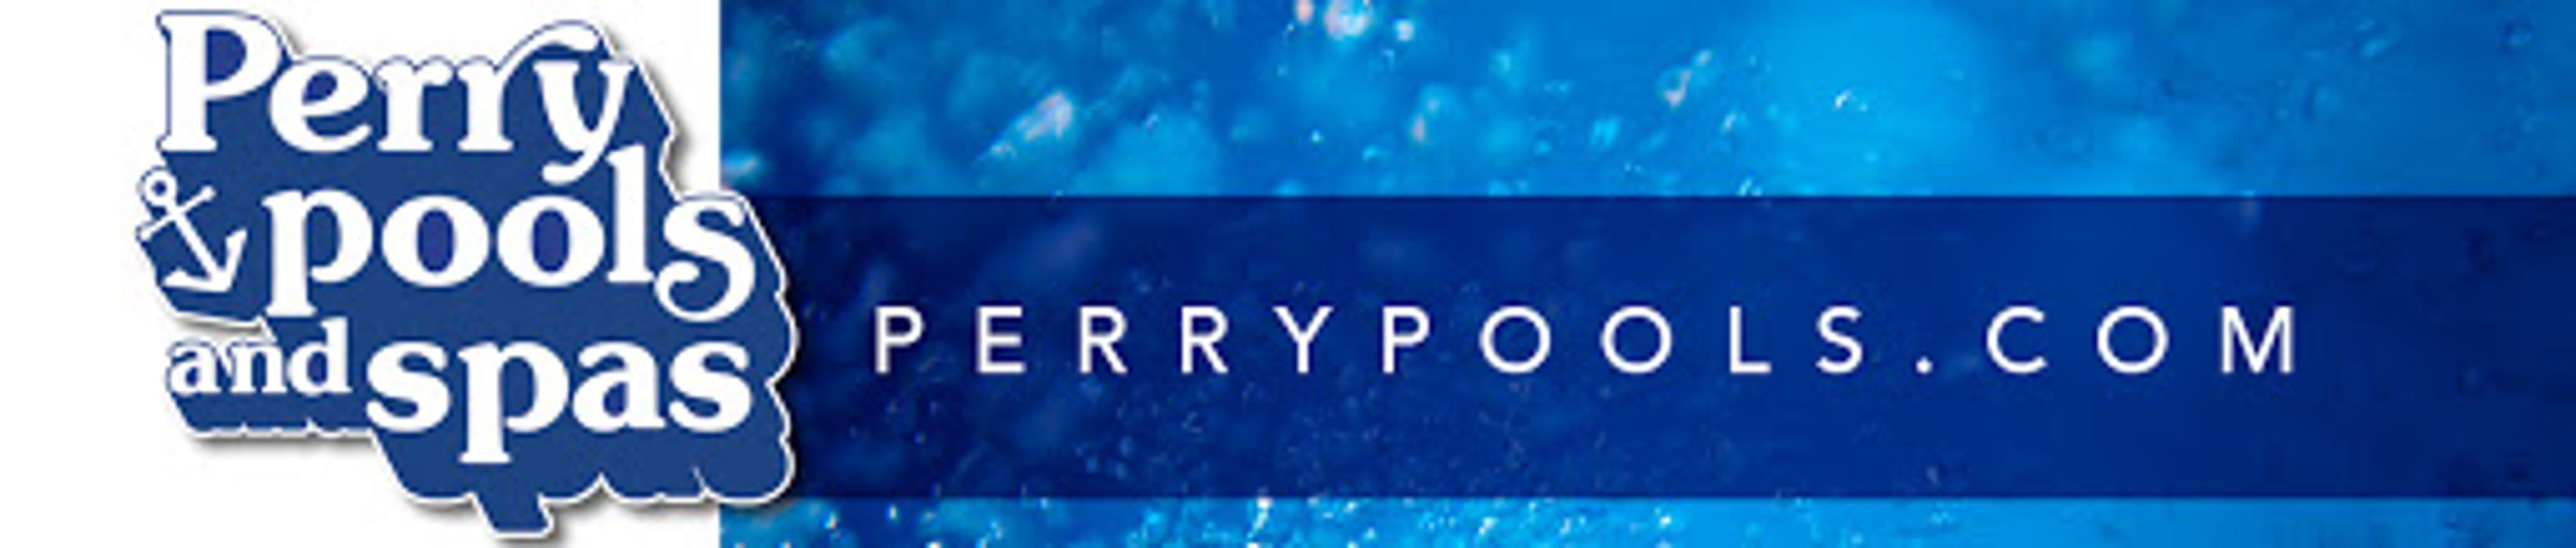 Perry Pools and Spas - Lynchburg, VA